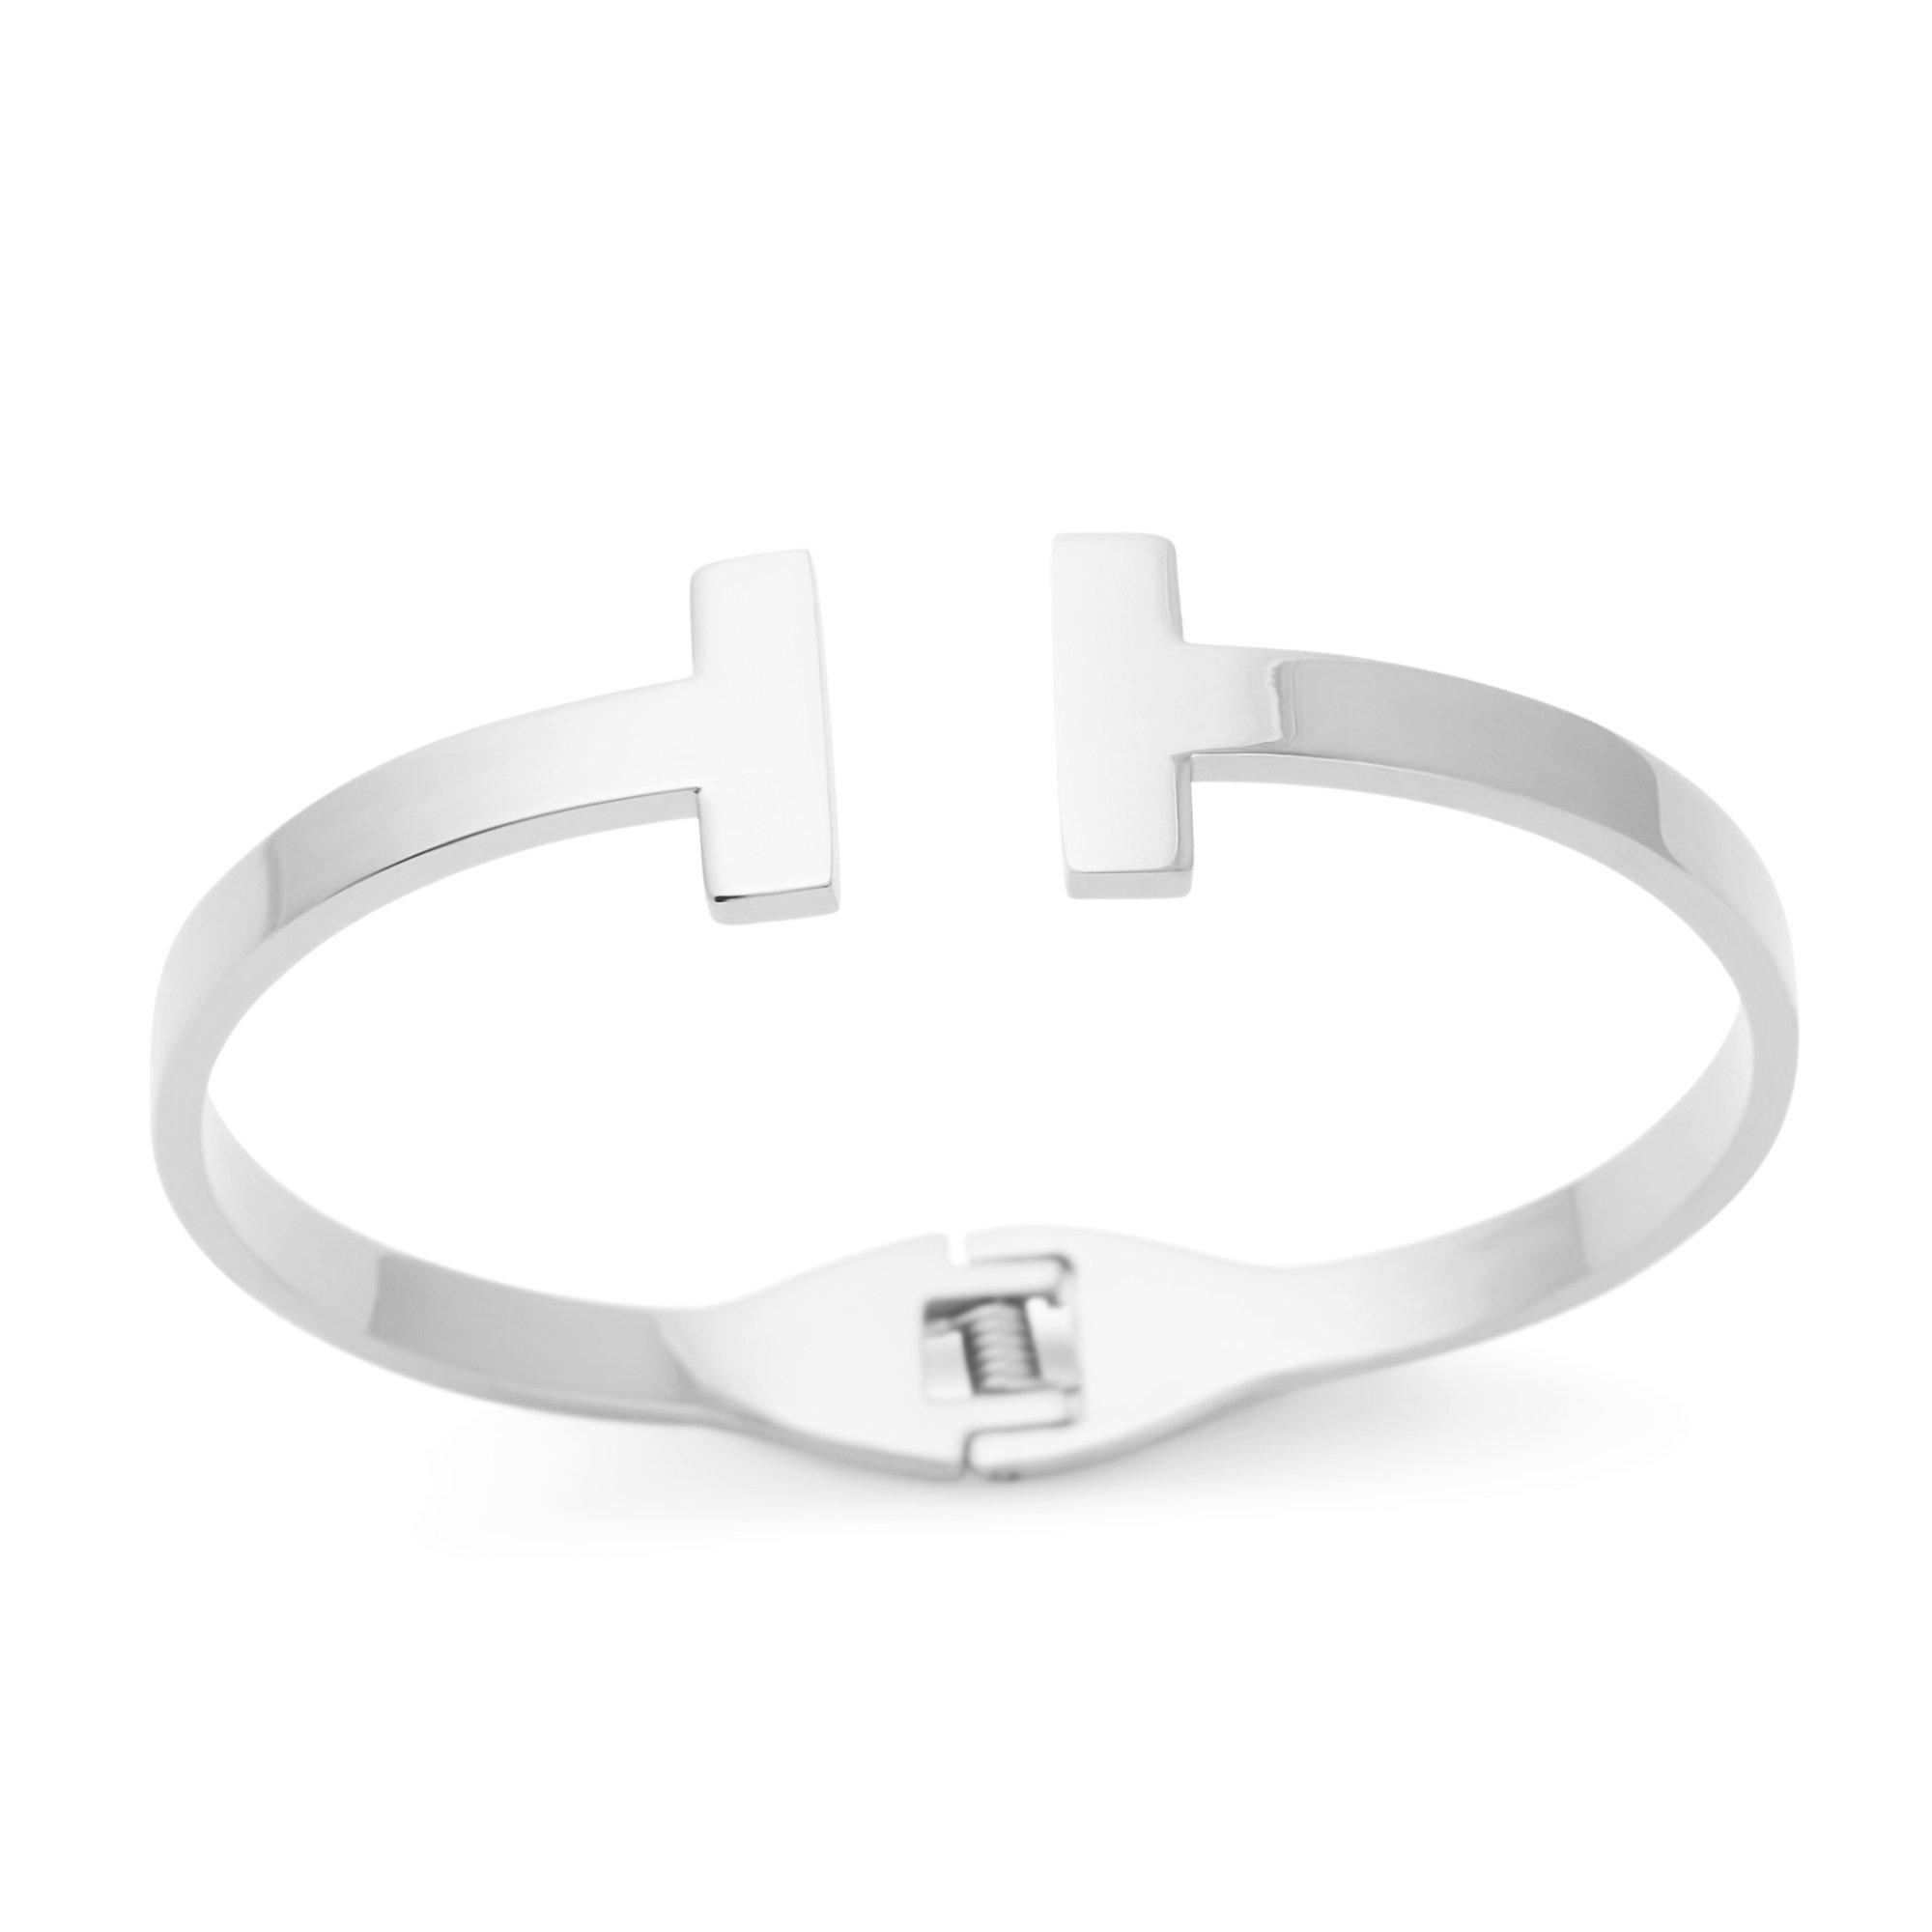 Toi&Moi T Bar Open Bangle   Double T Cuff (Silver)